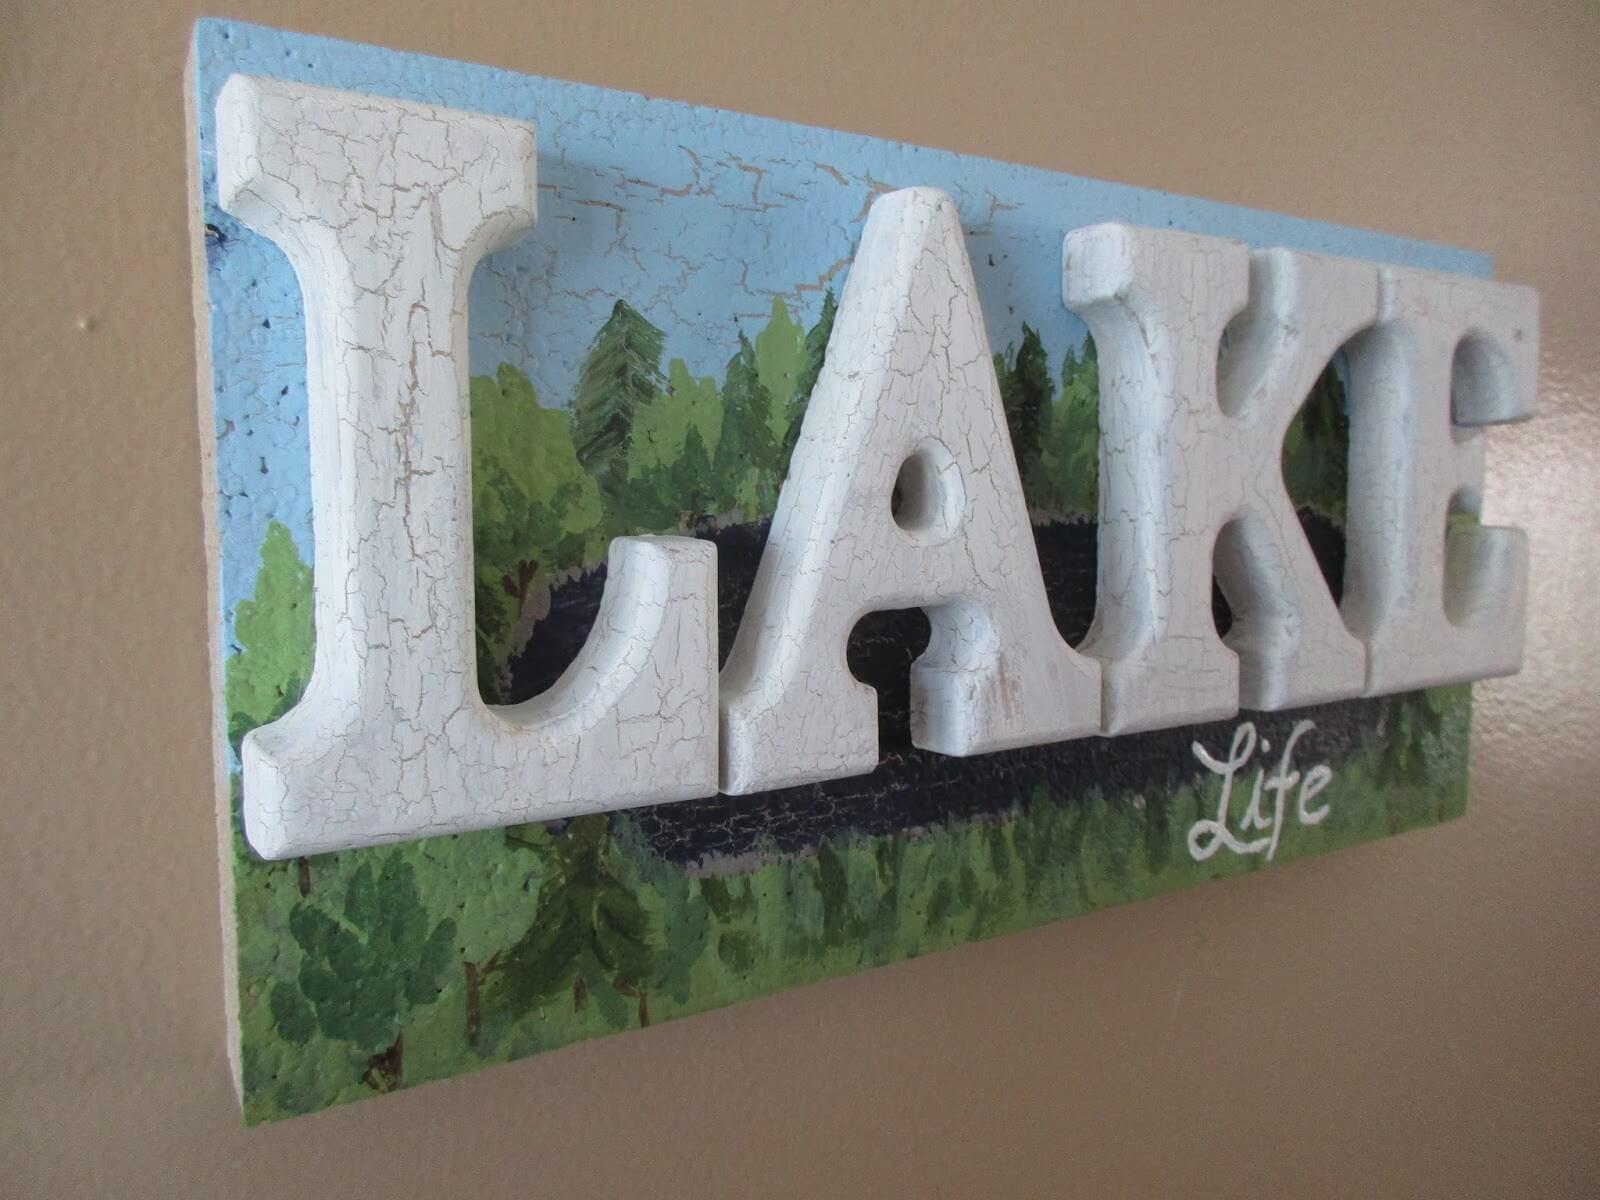 Three Dimensional Lake Life Sign